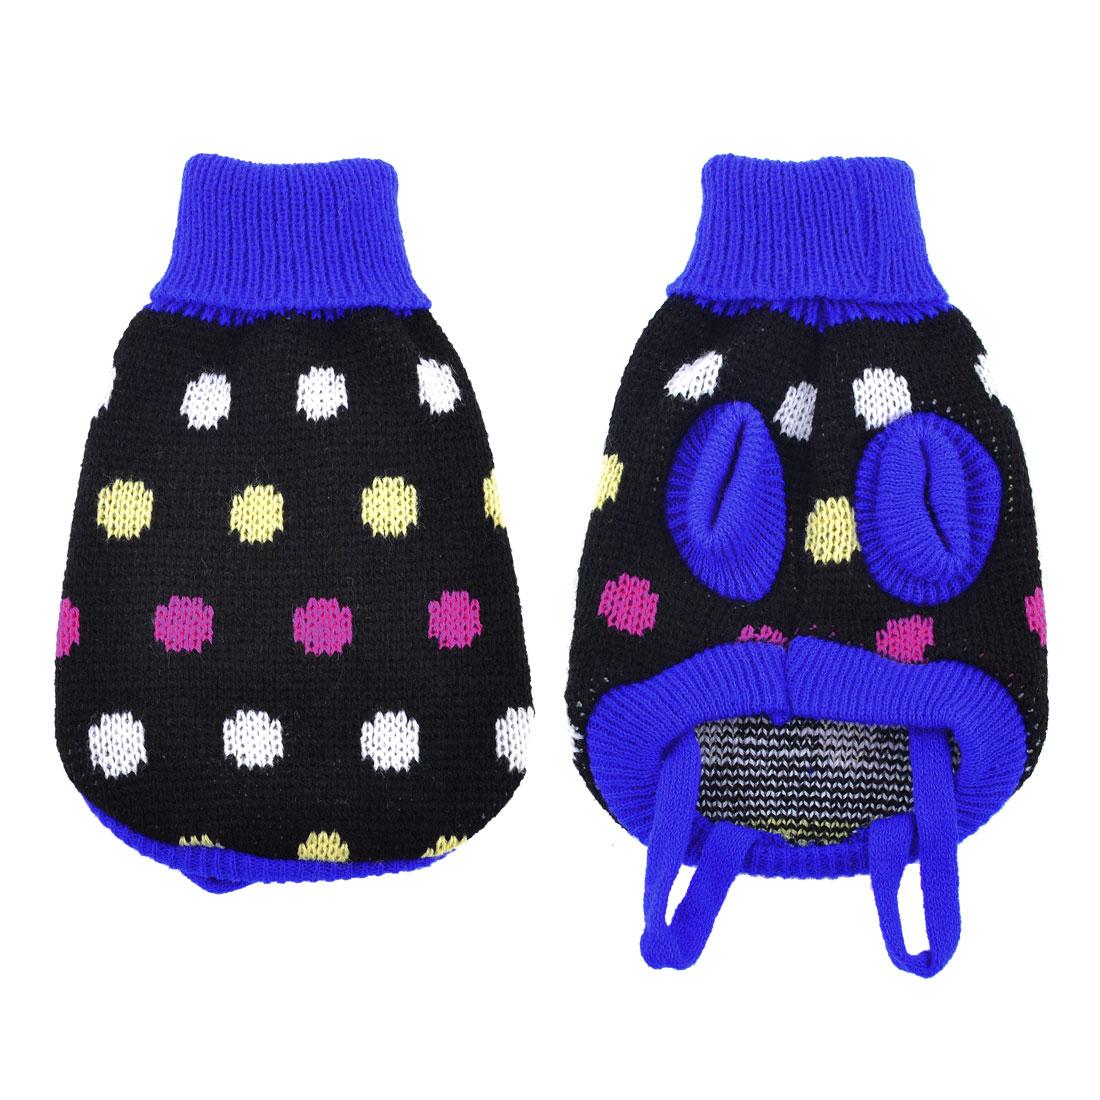 Pet Dog Puppy Black Blue Dot Print Turtleneck Warm Sweater Clothing Coat XXS